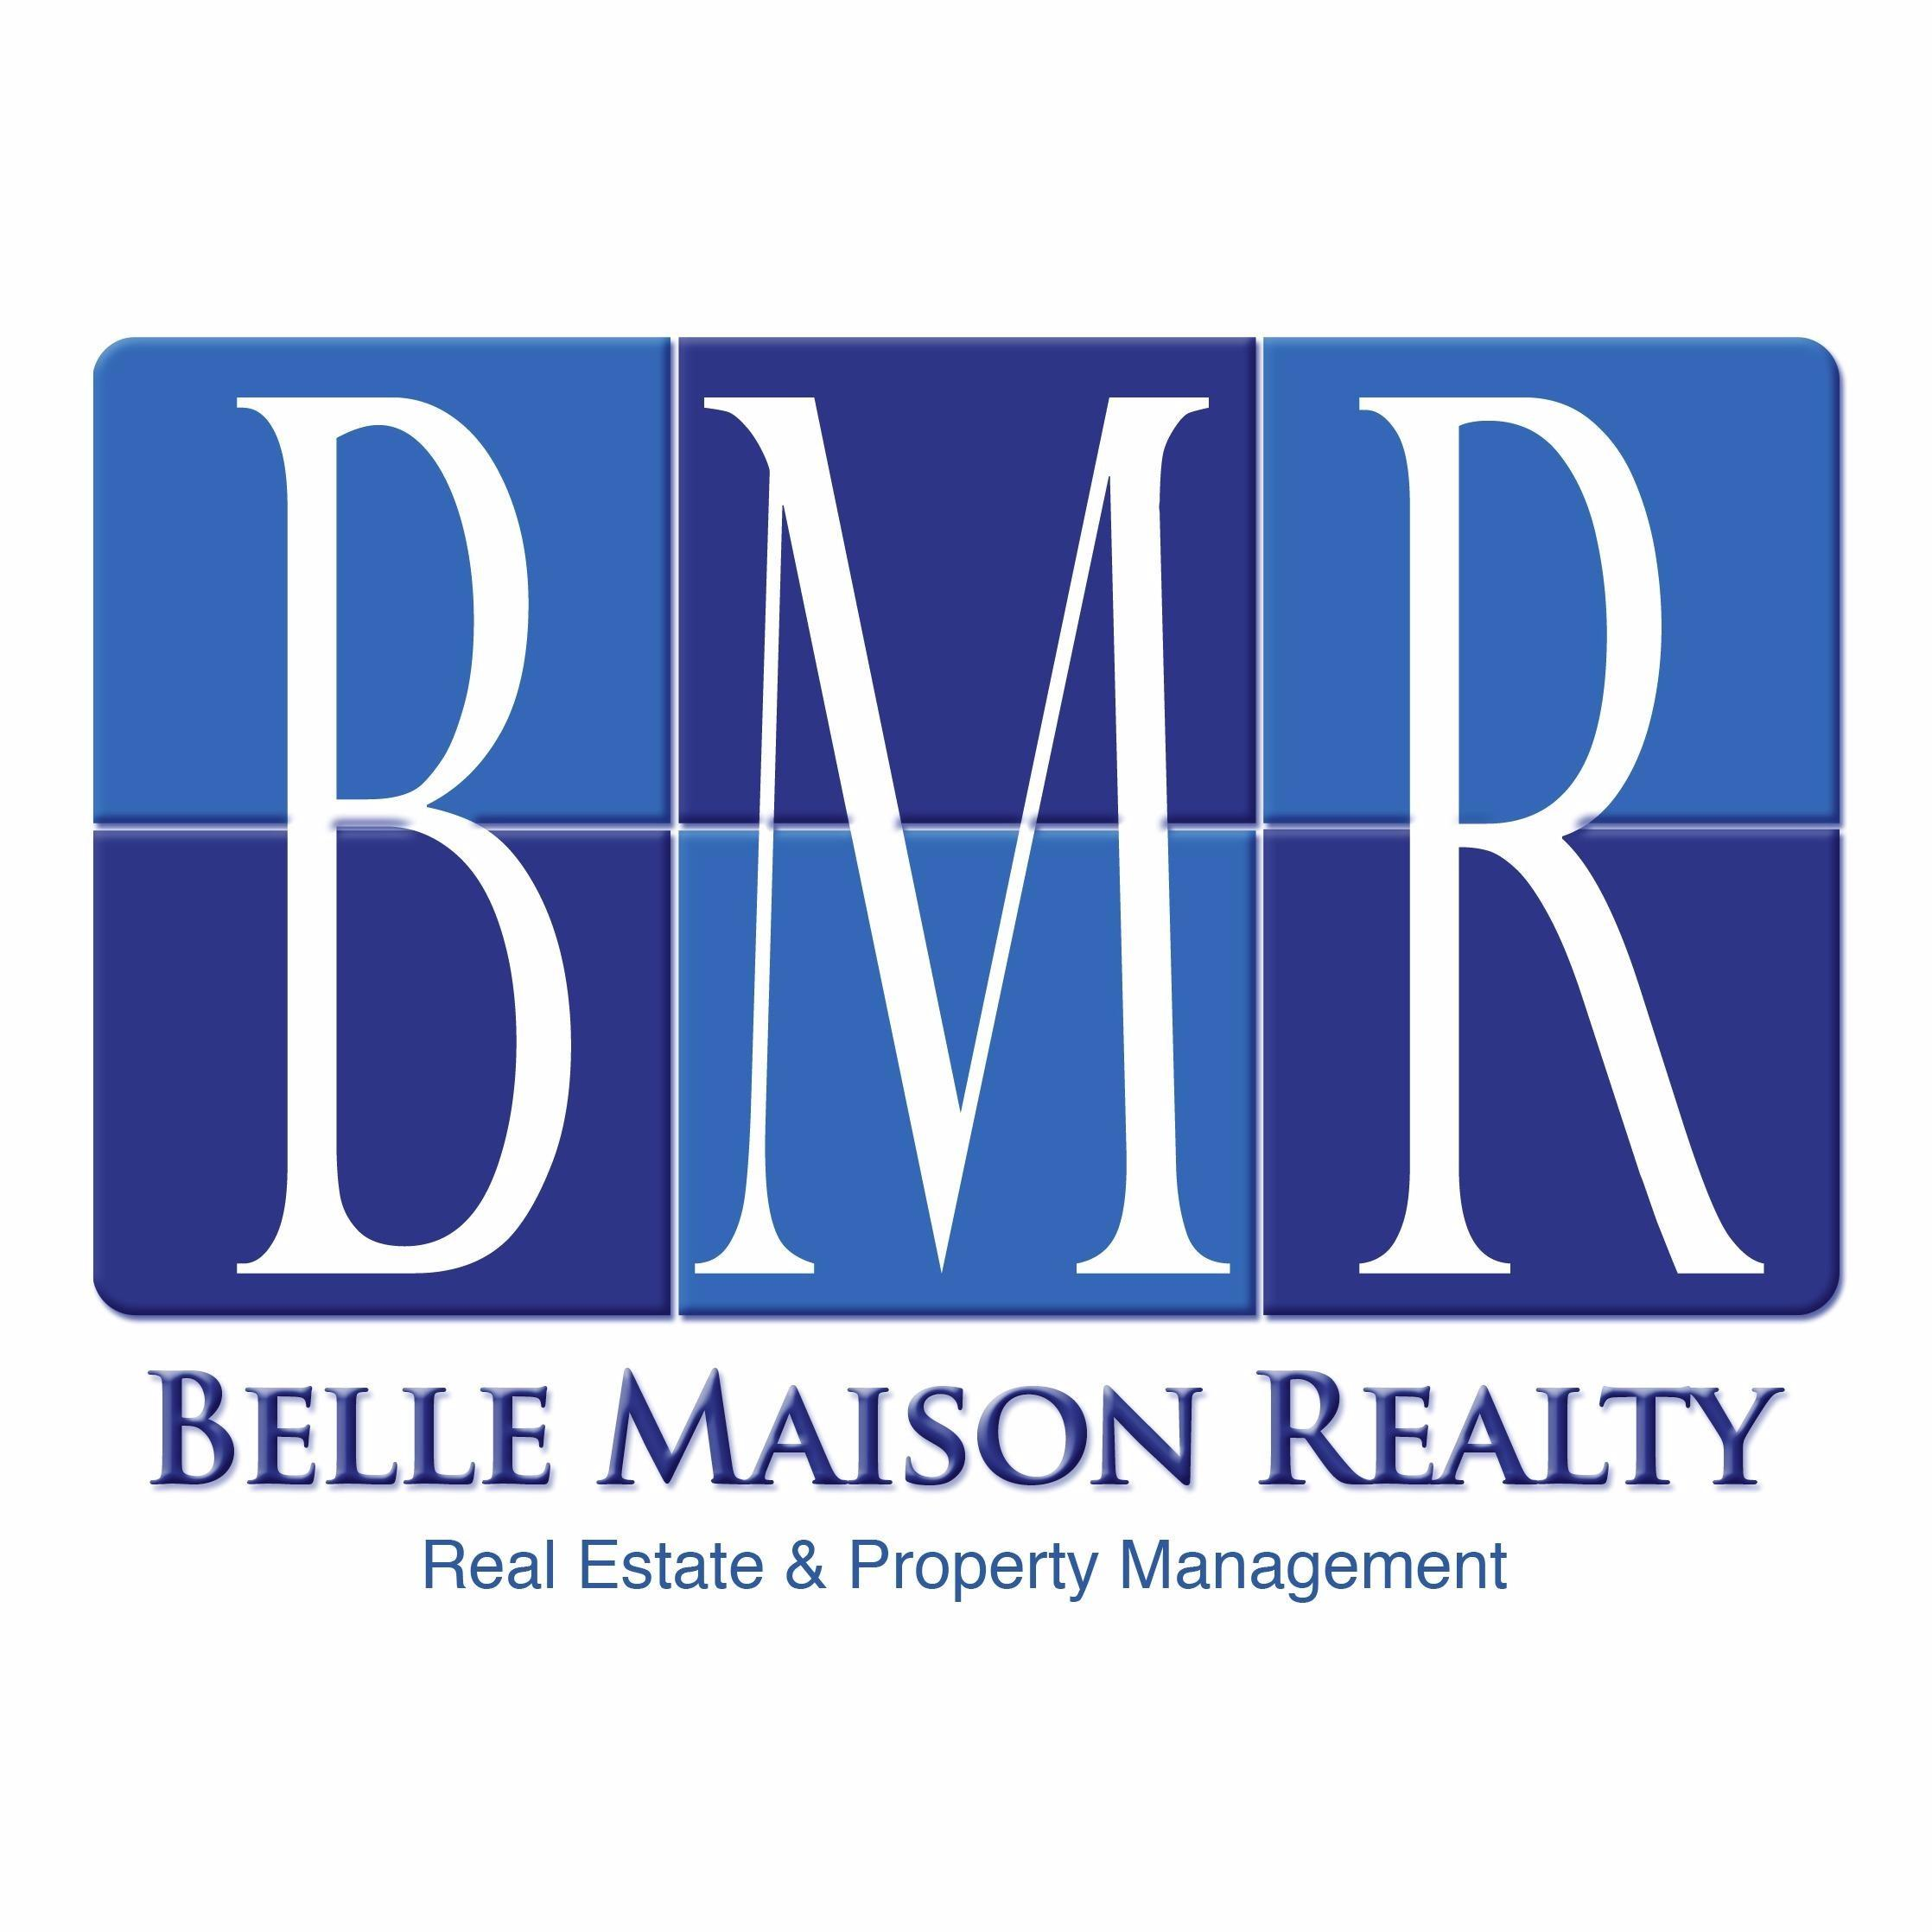 Belle Maison Realty